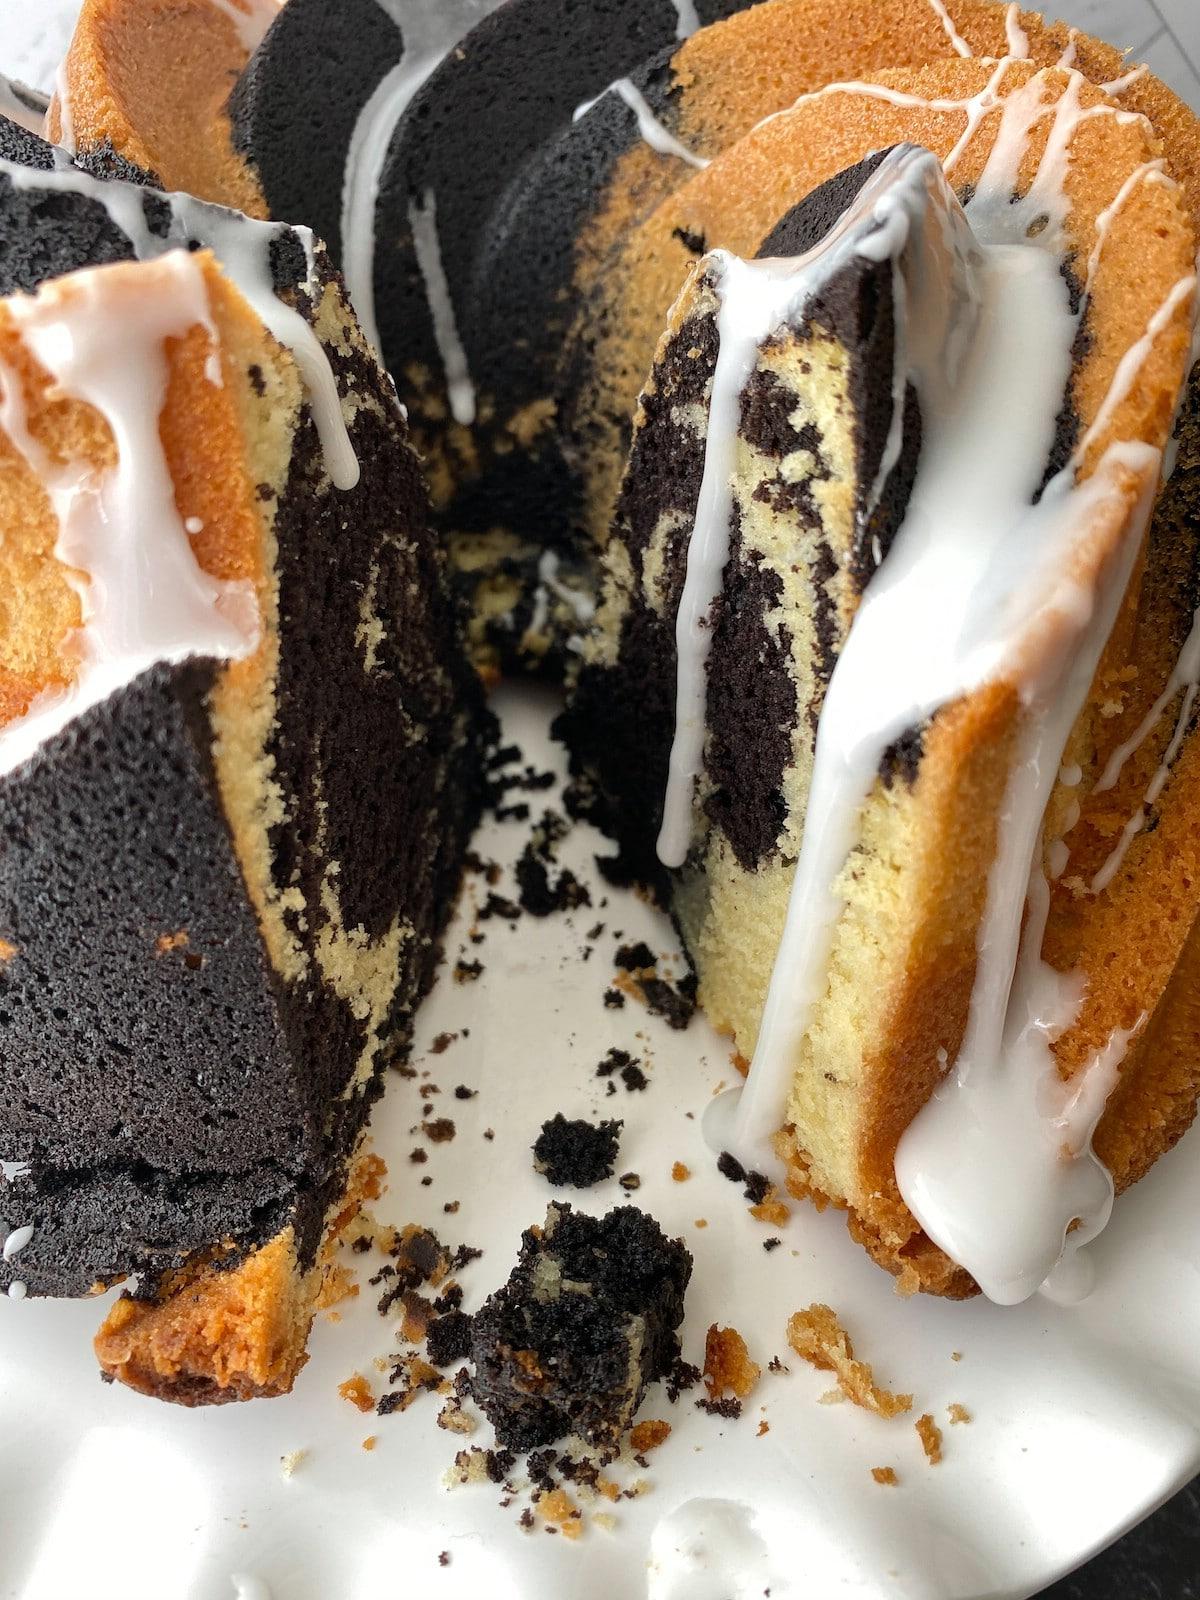 Slice out of sGlazed swirl bundt cake on standwirl bundt cake on stand